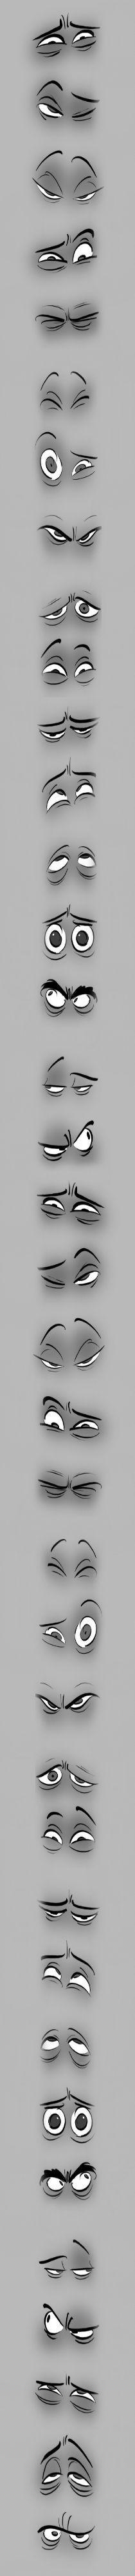 Drawing Eyes   -